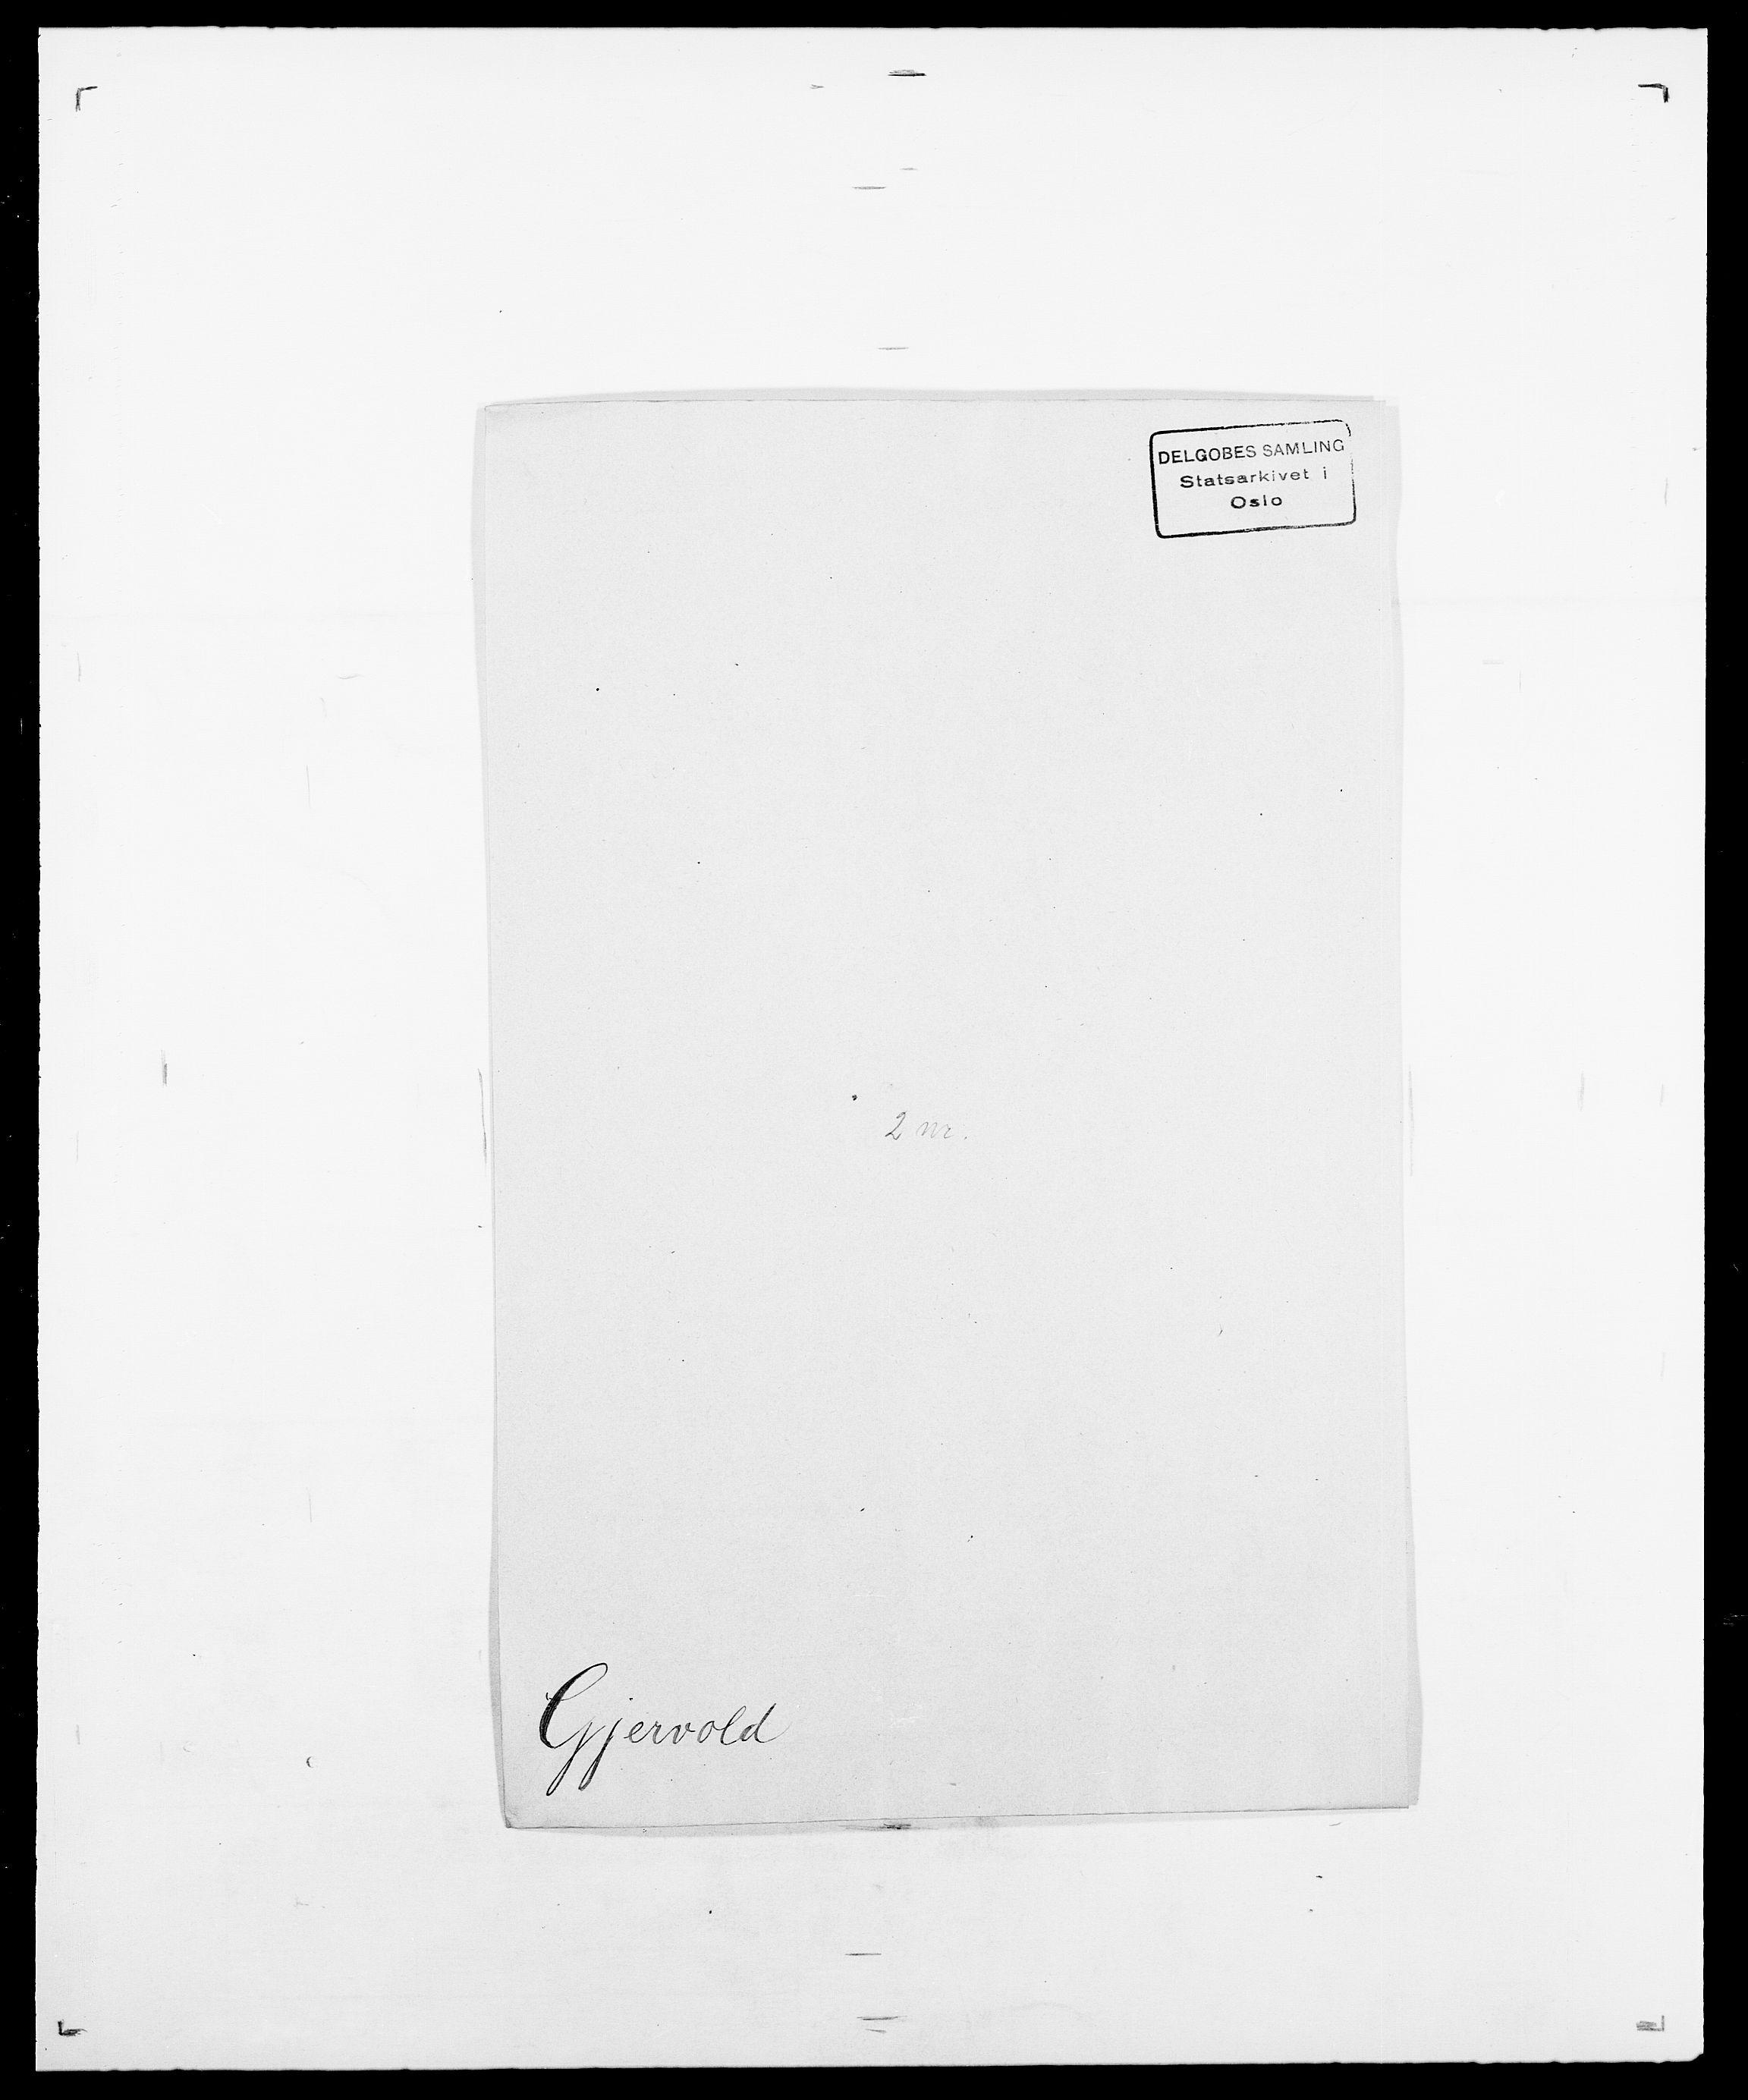 SAO, Delgobe, Charles Antoine - samling, D/Da/L0014: Giebdhausen - Grip, s. 179